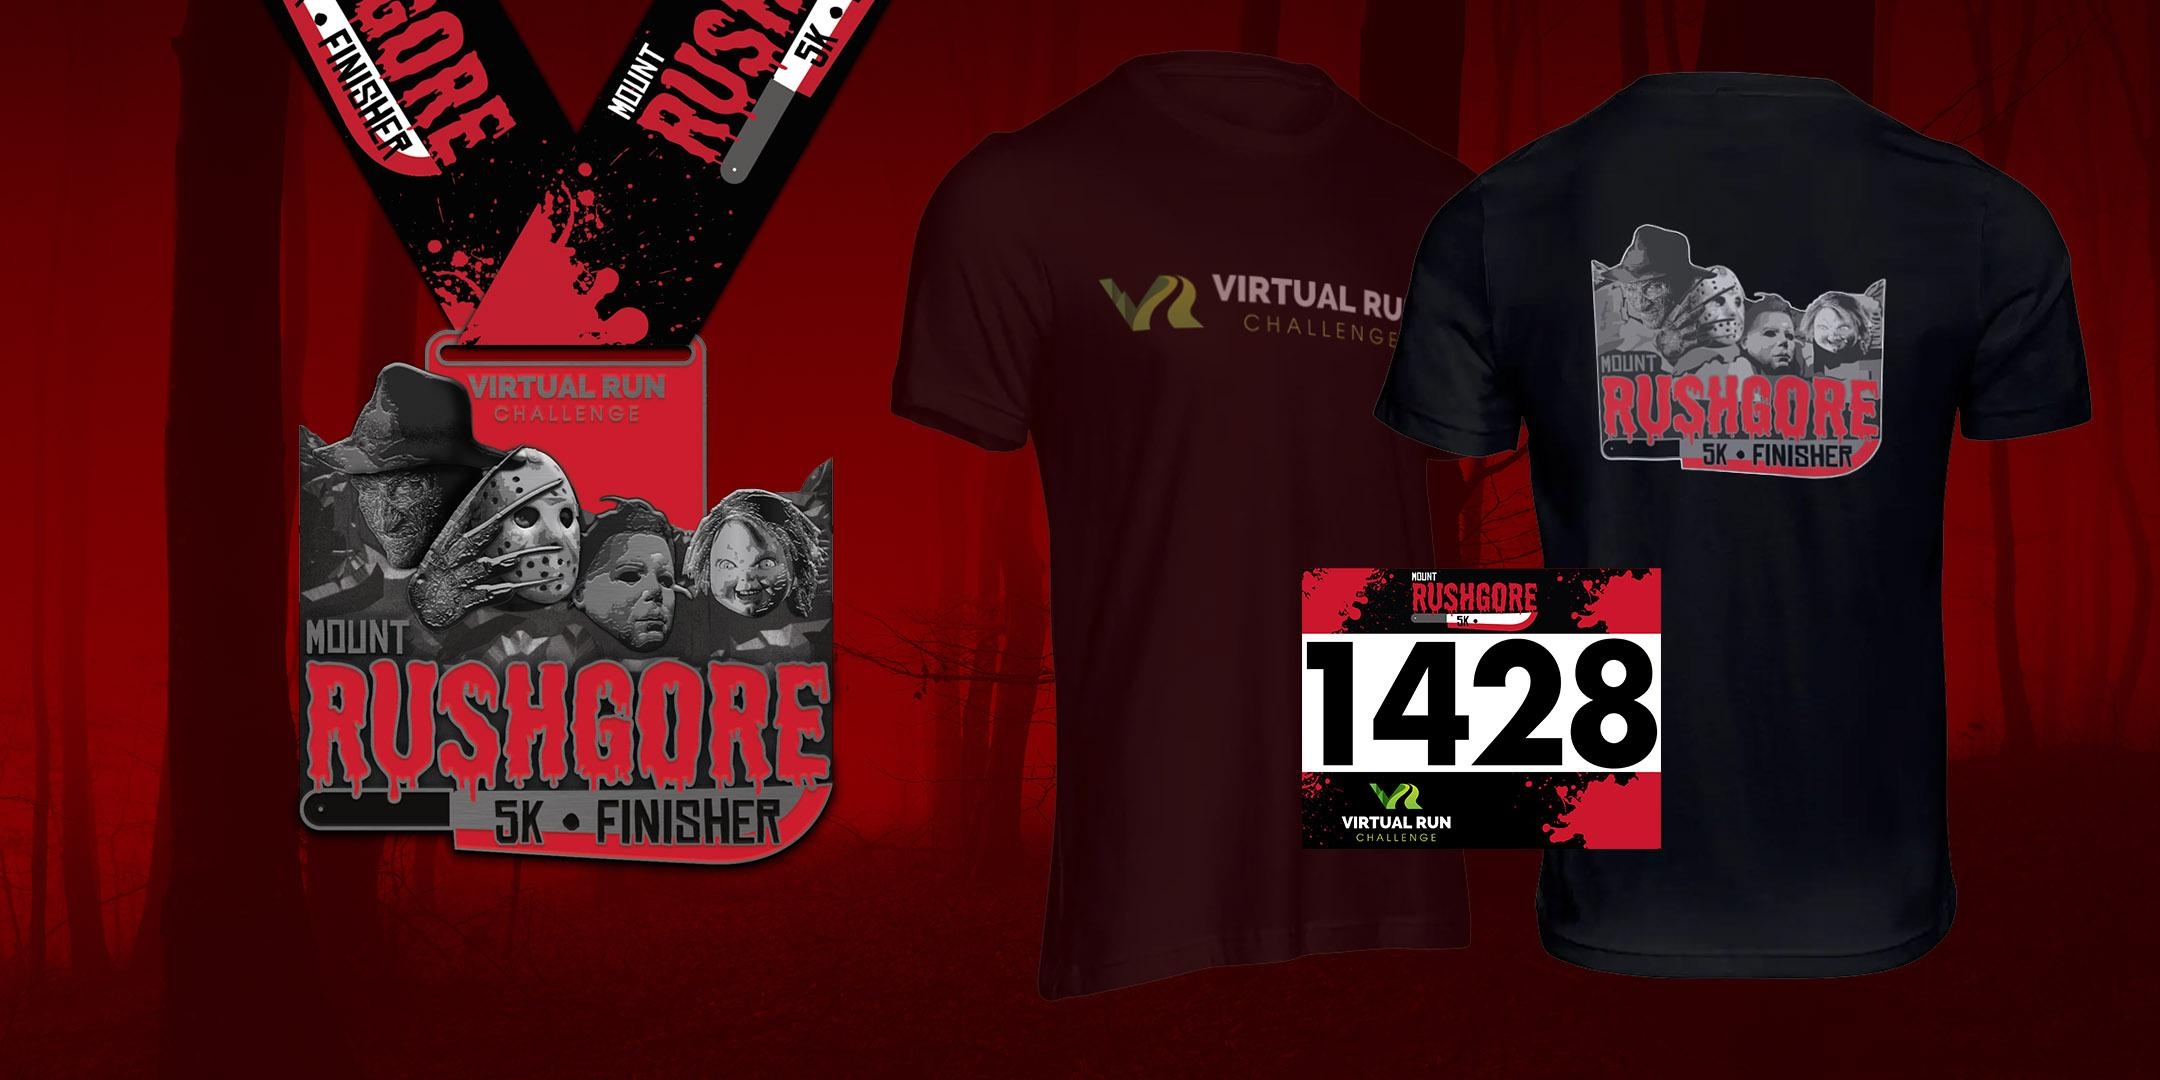 Irving Halloween 2020 2020   Mount RushGore Virtual 5k Halloween Run   Irving   1 OCT 2020